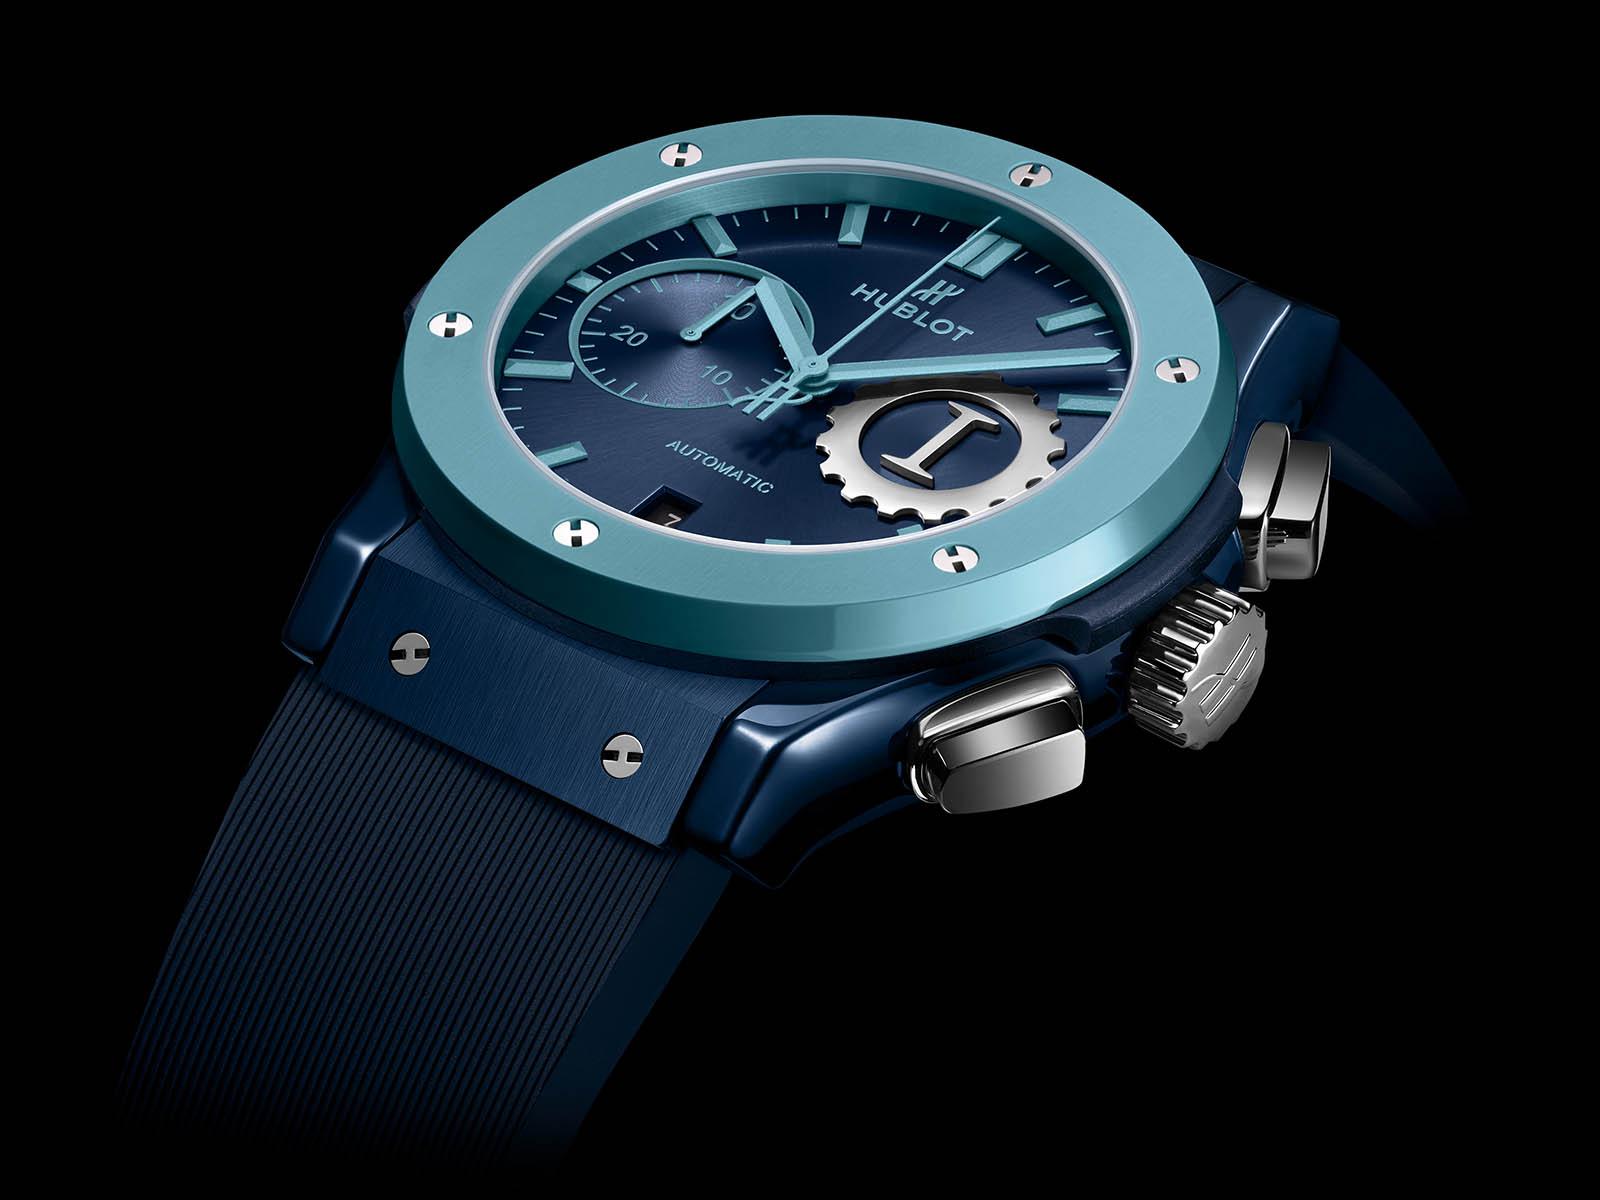 hublot-classic-fusion-chronograph-garage-italia-521-ex-7170-rx-git19-6.jpg